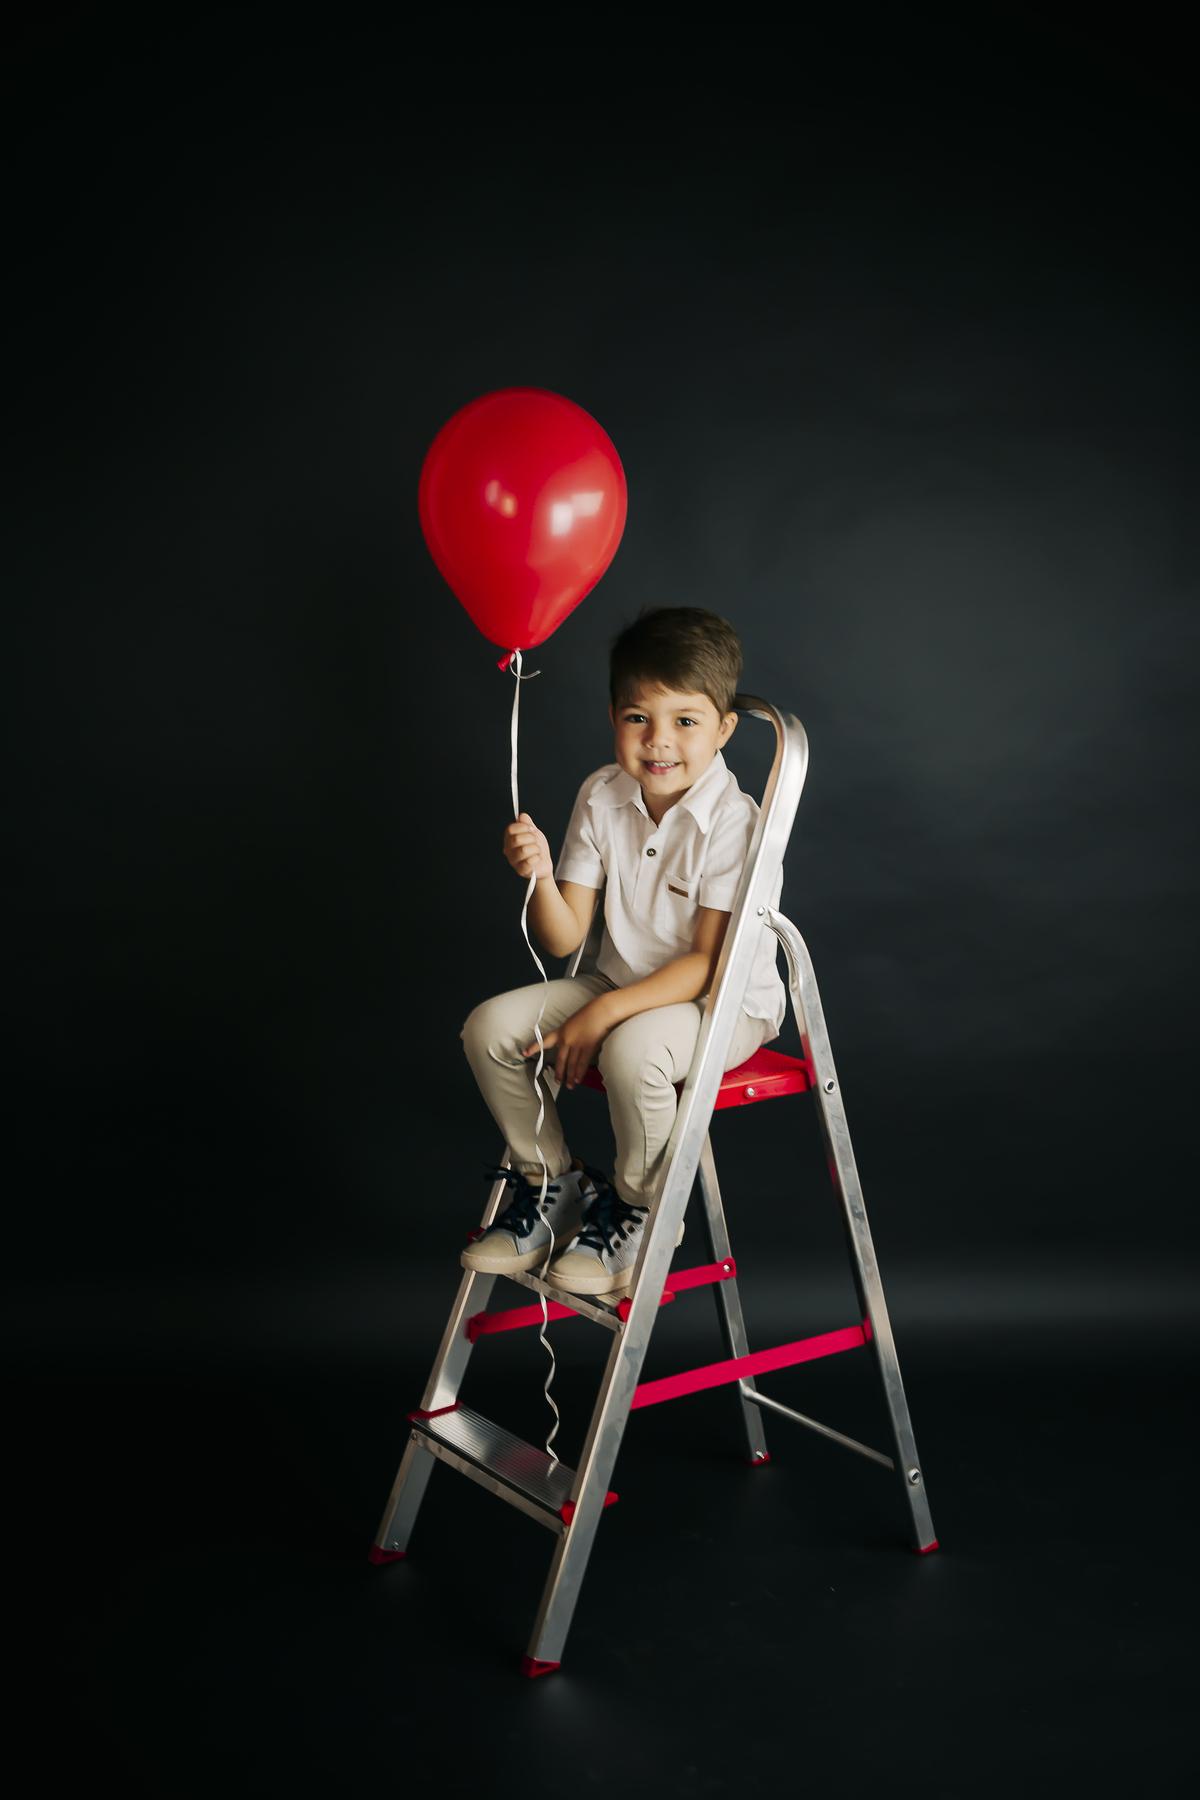 Fotografia infantil estúdio Gabi Aine, Brasilia